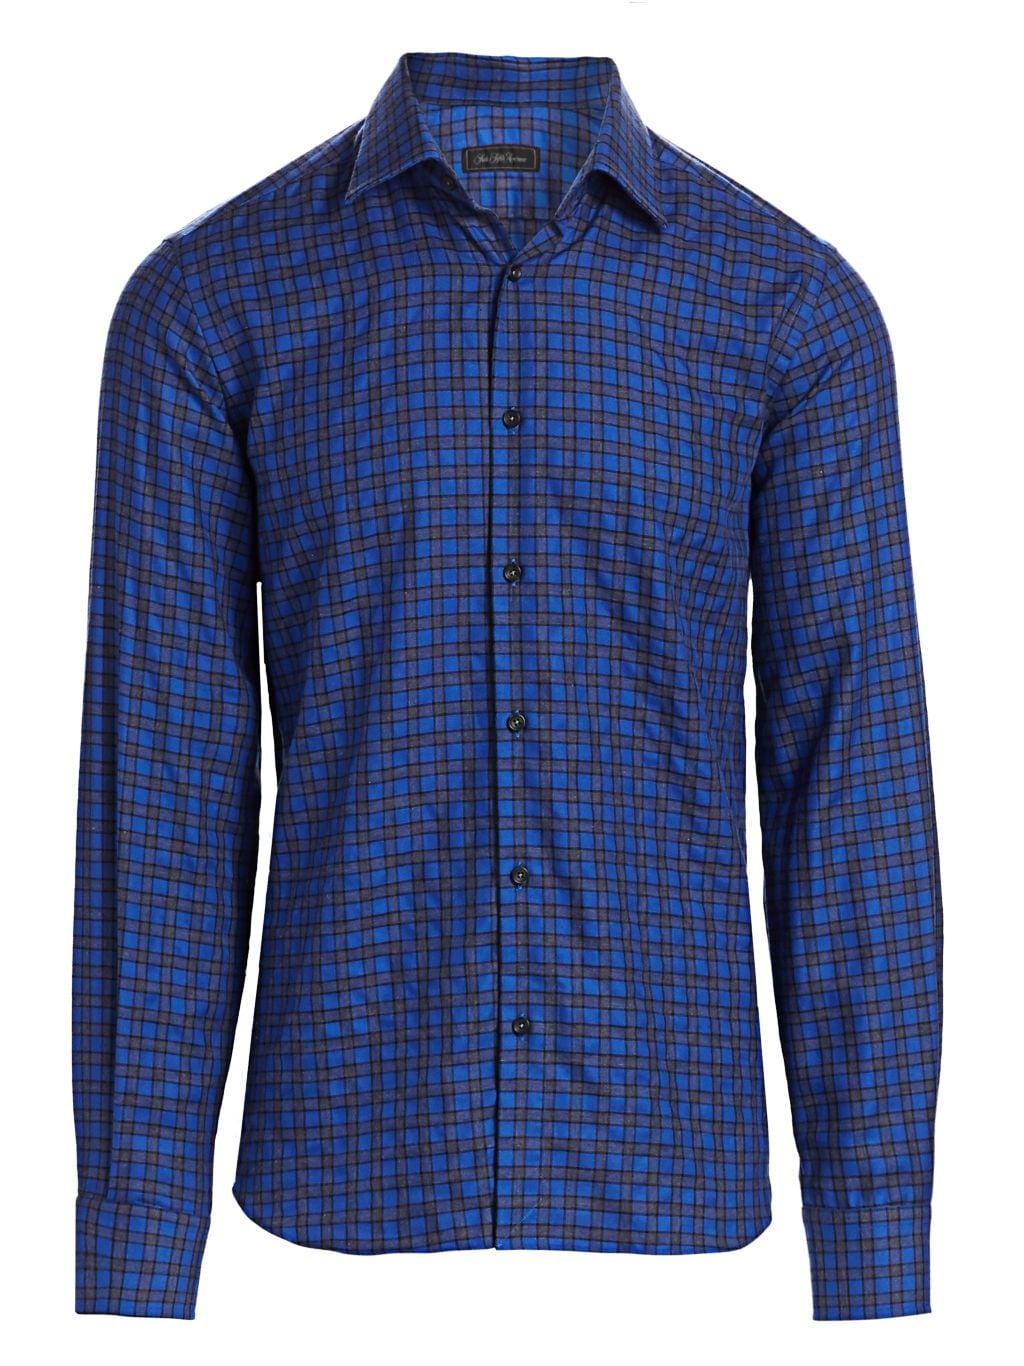 Saks Fifth Avenue COLLECTION Mini Check Print Shirt